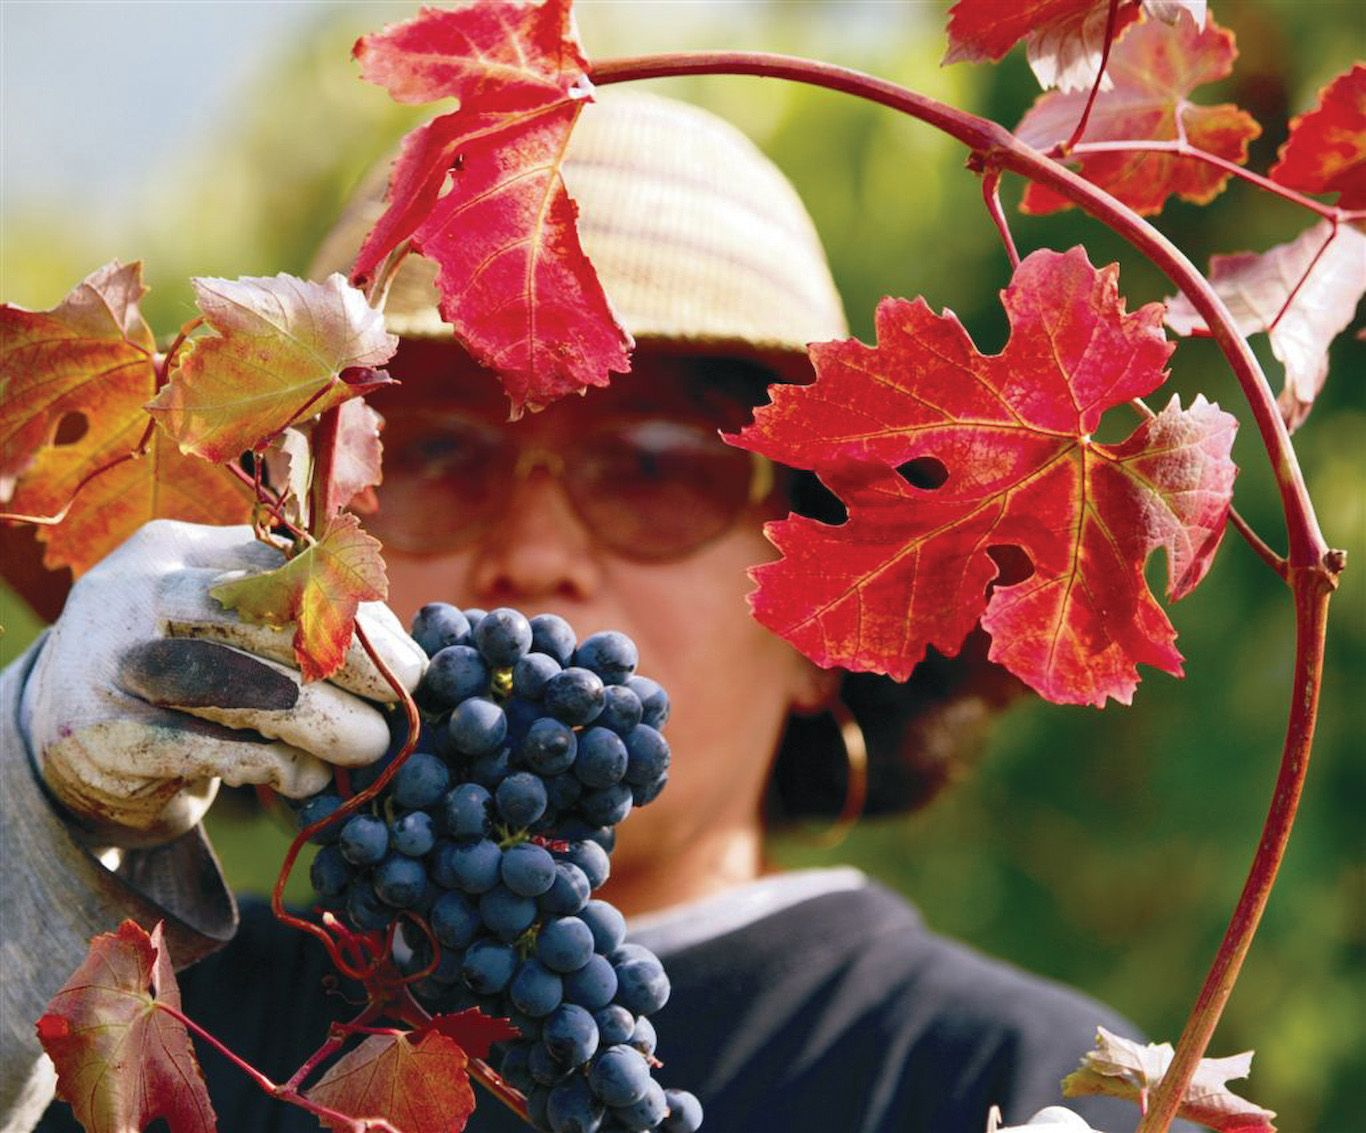 Brooklyn Winery Urban Winery New York Wines Wedding Venue And Wine Bar Brooklyn Winery Winemaking Winery